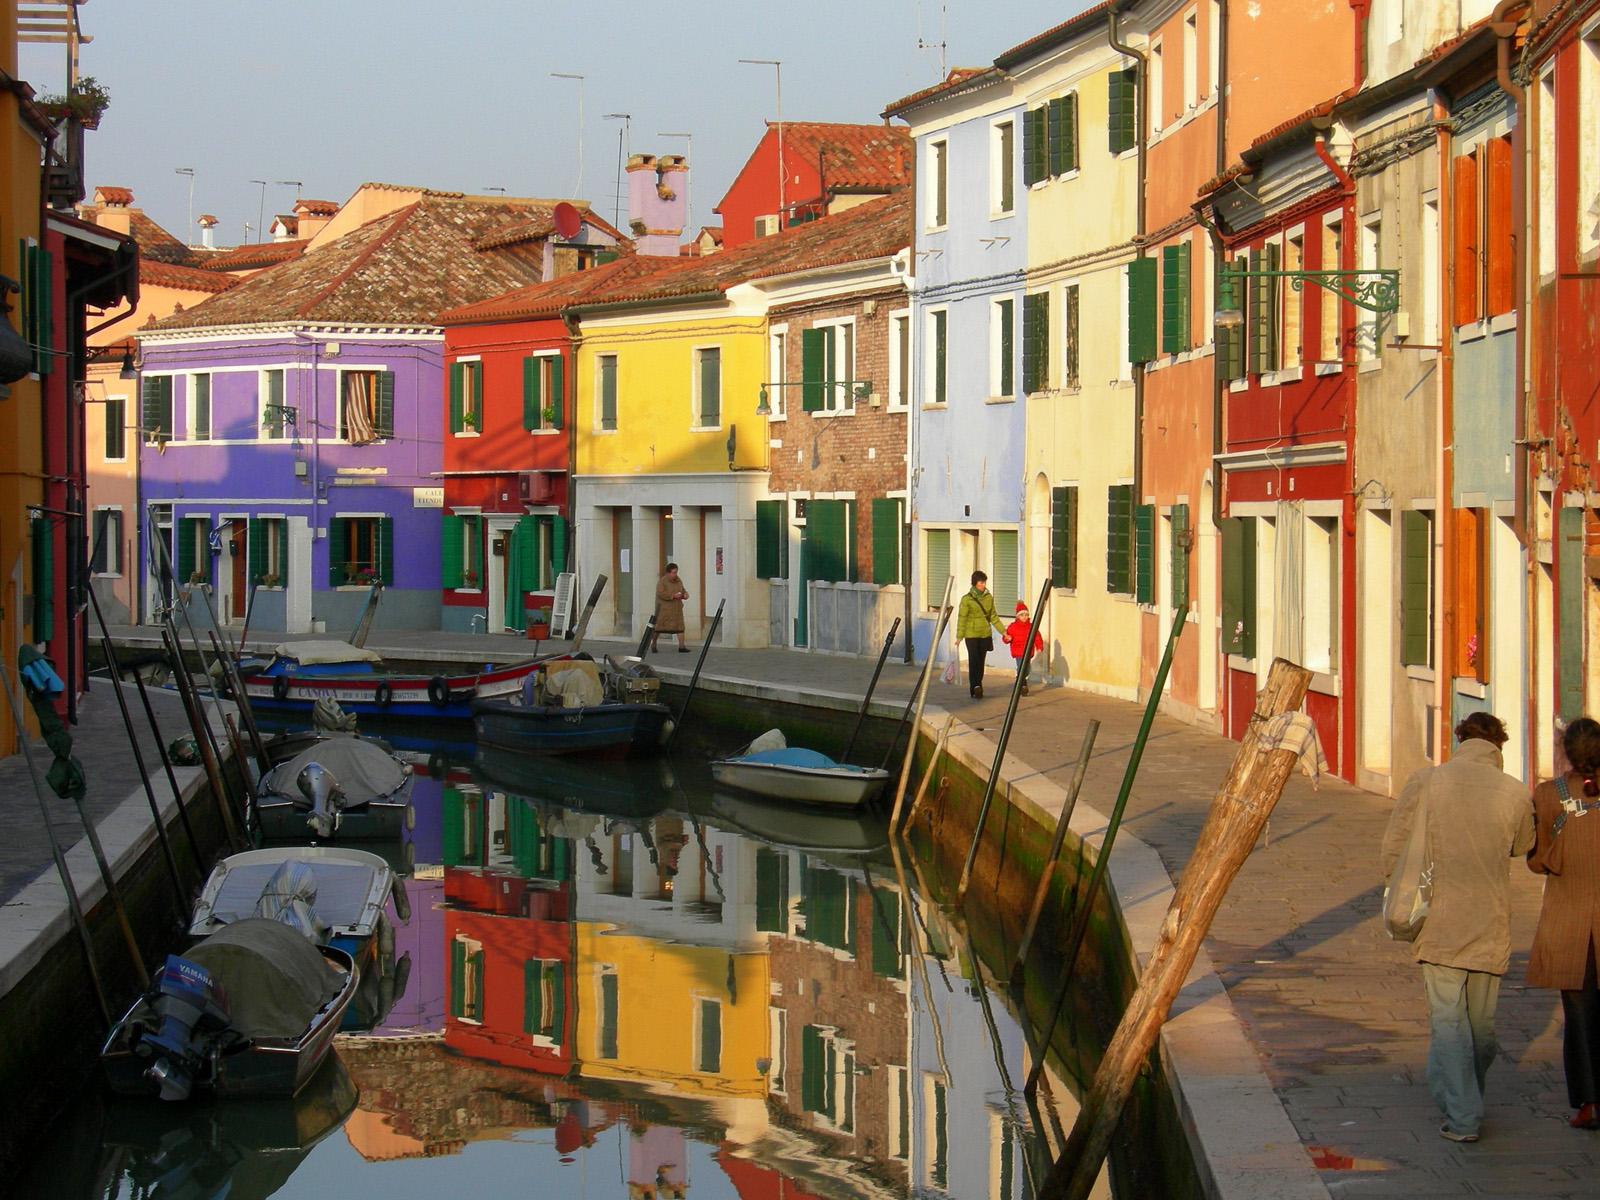 Destination Tour Venice Italy